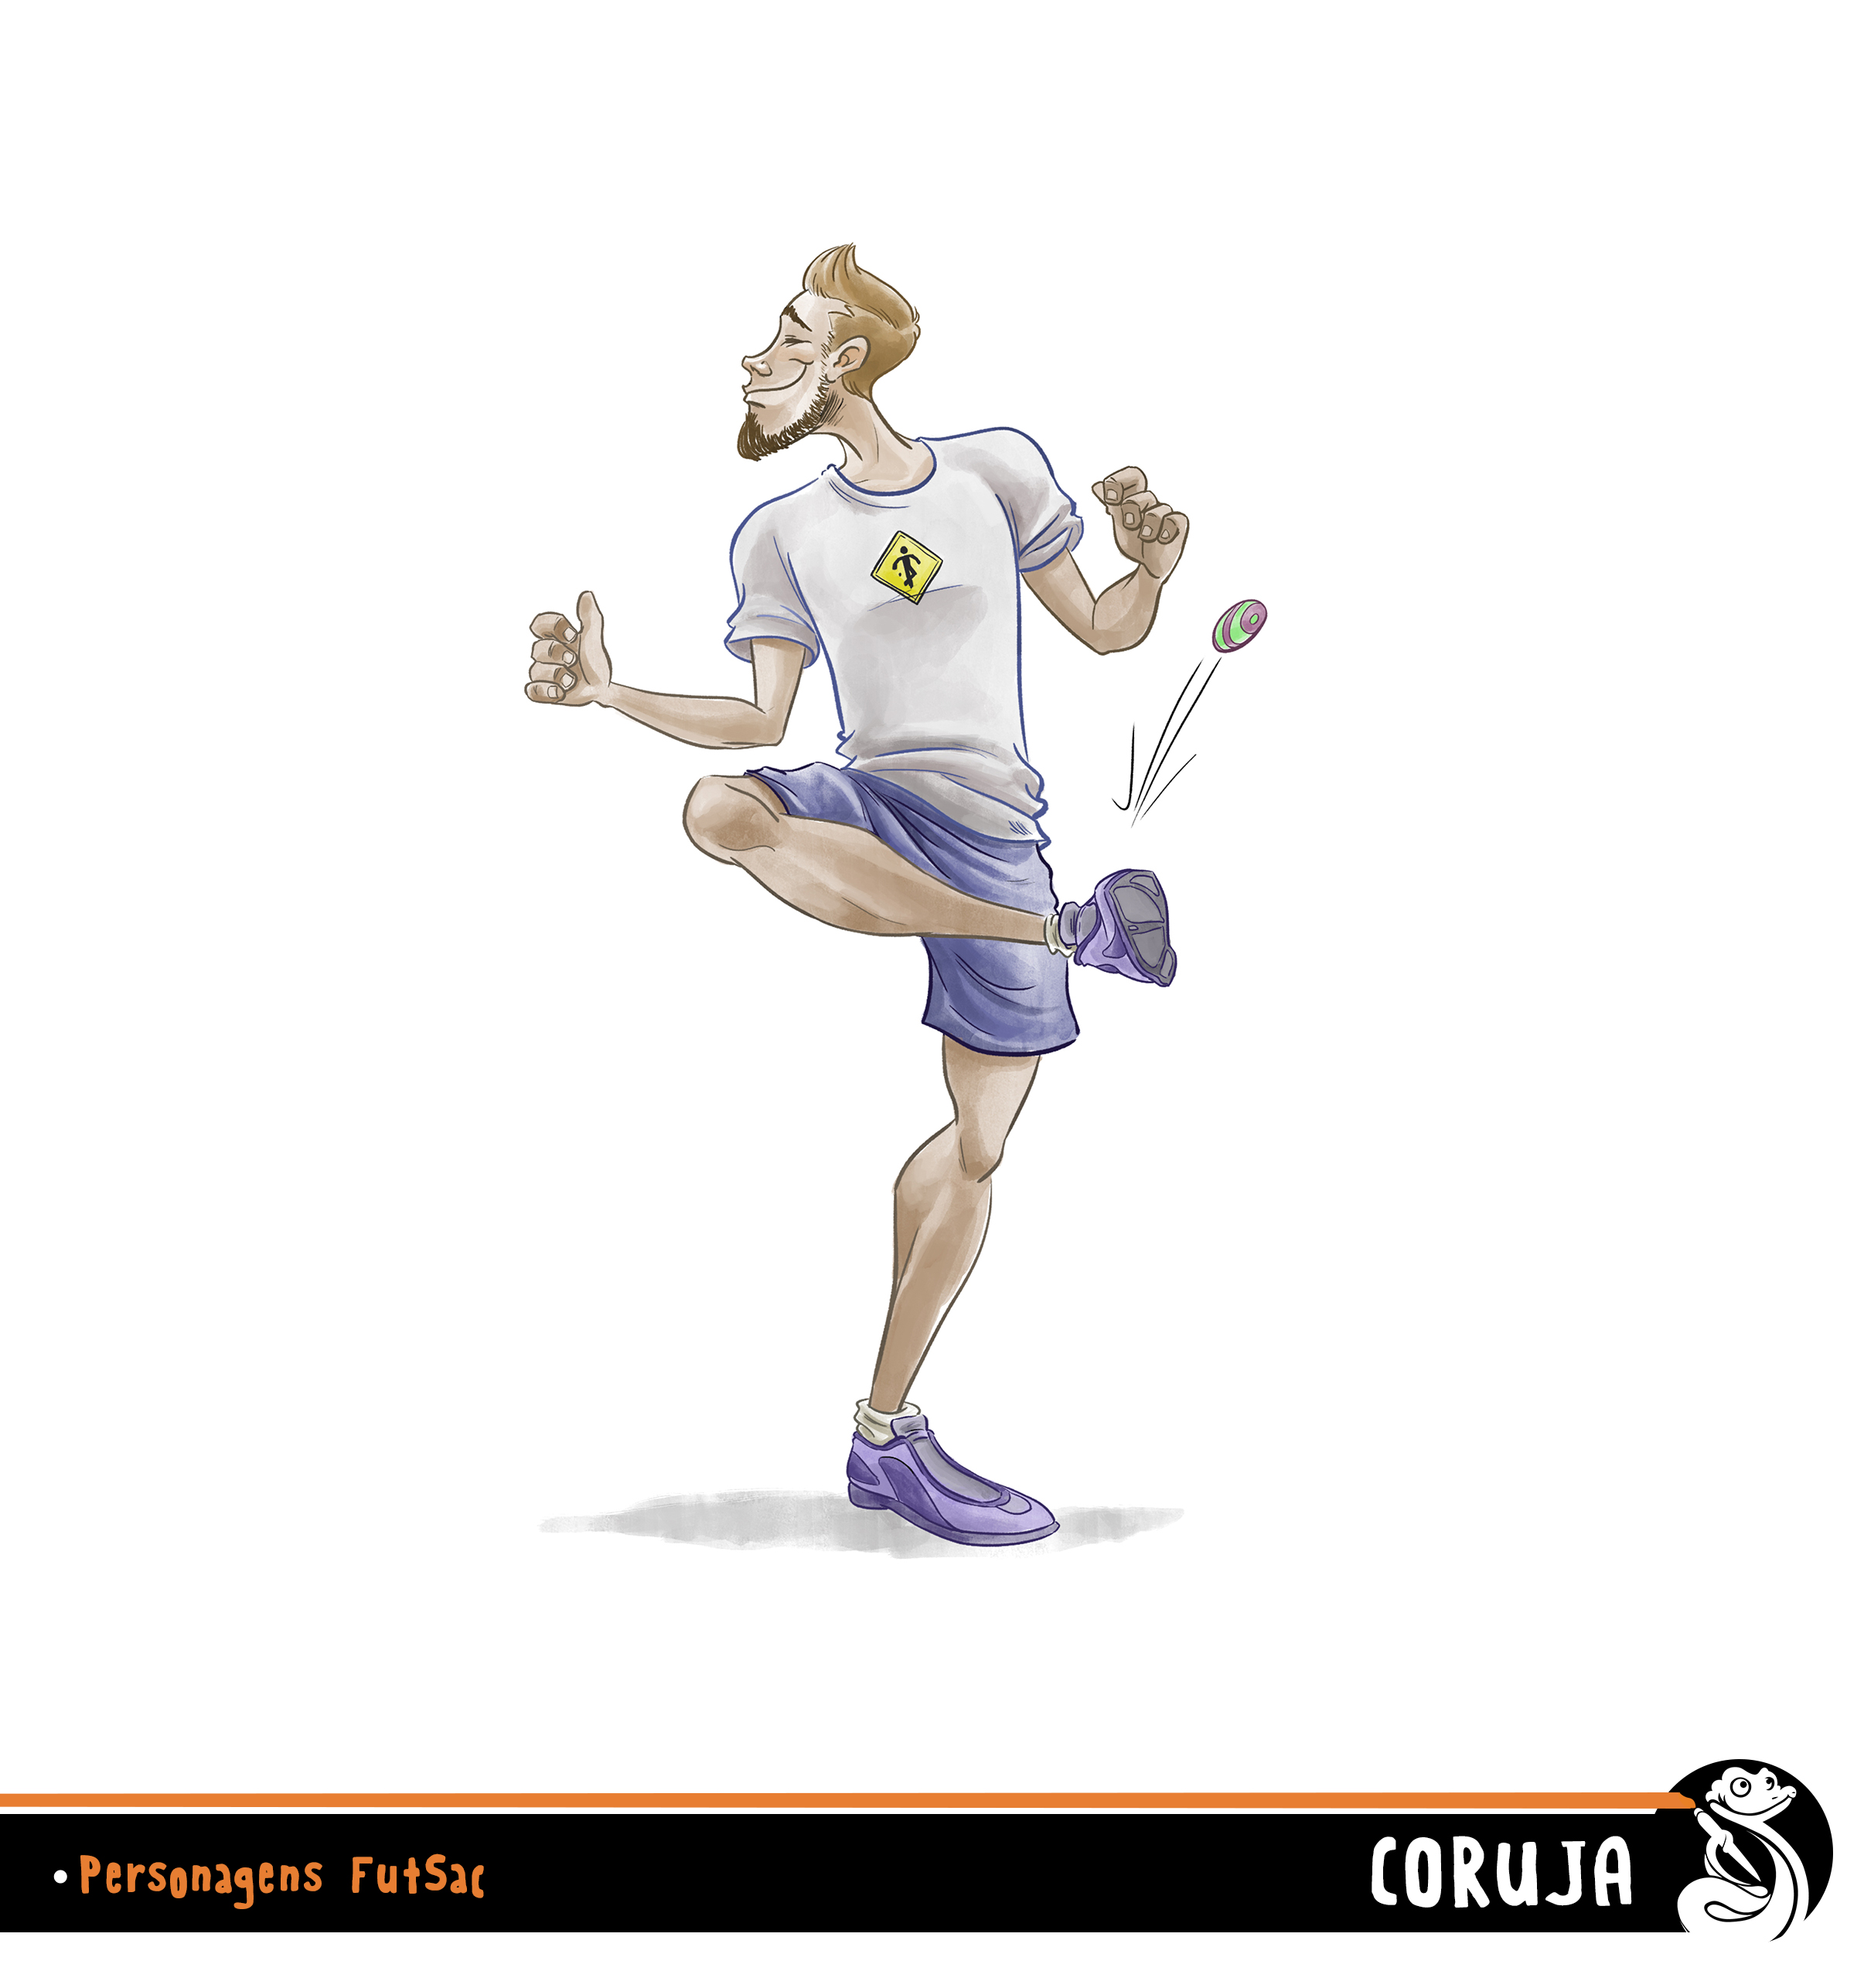 15-jogadas_cor_CorujaALTA